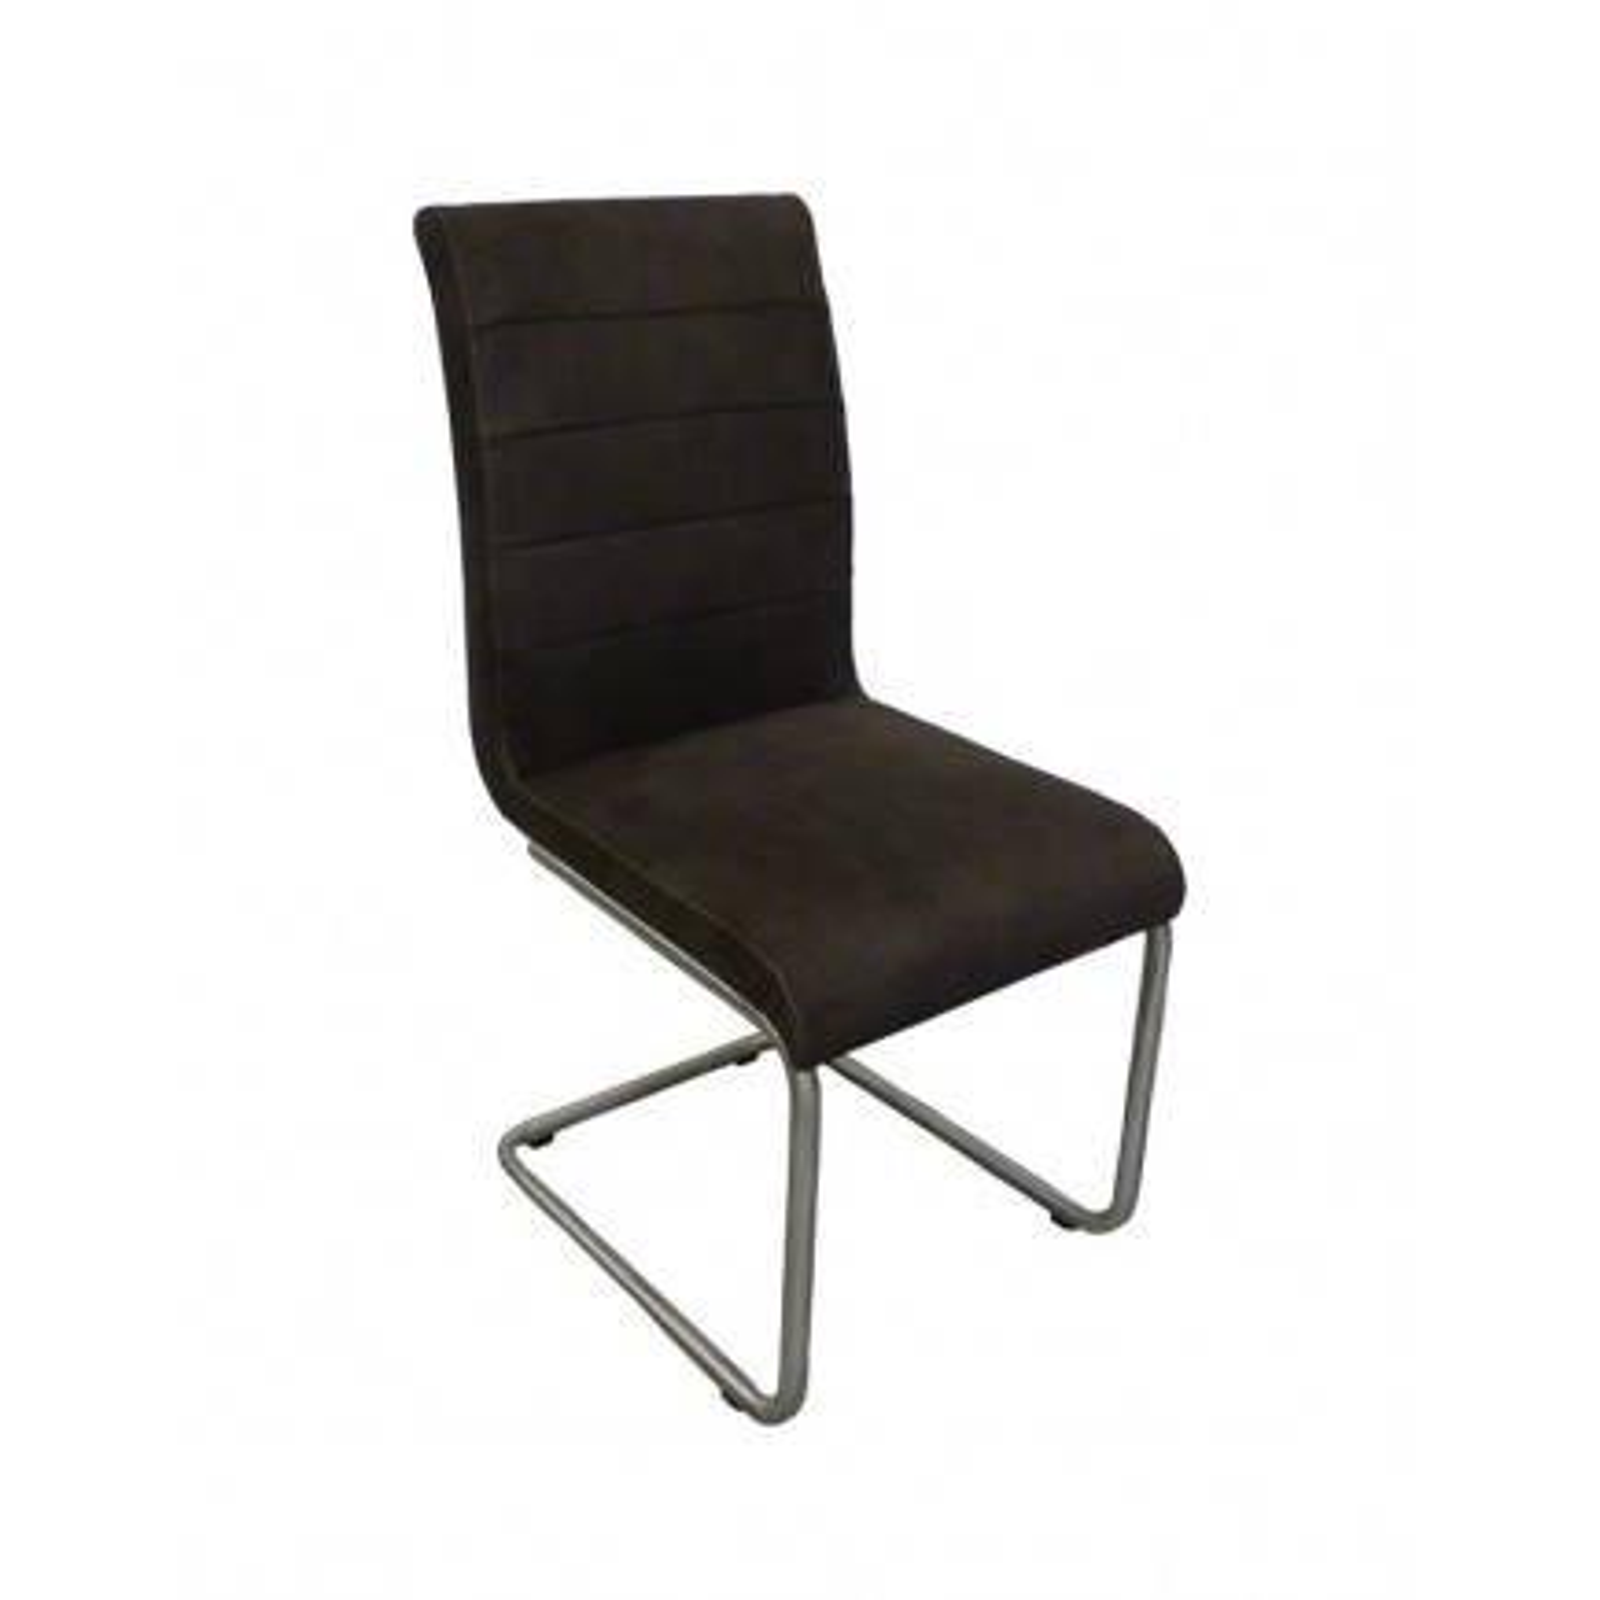 Chaise Lizzy Microfibre - chaise design